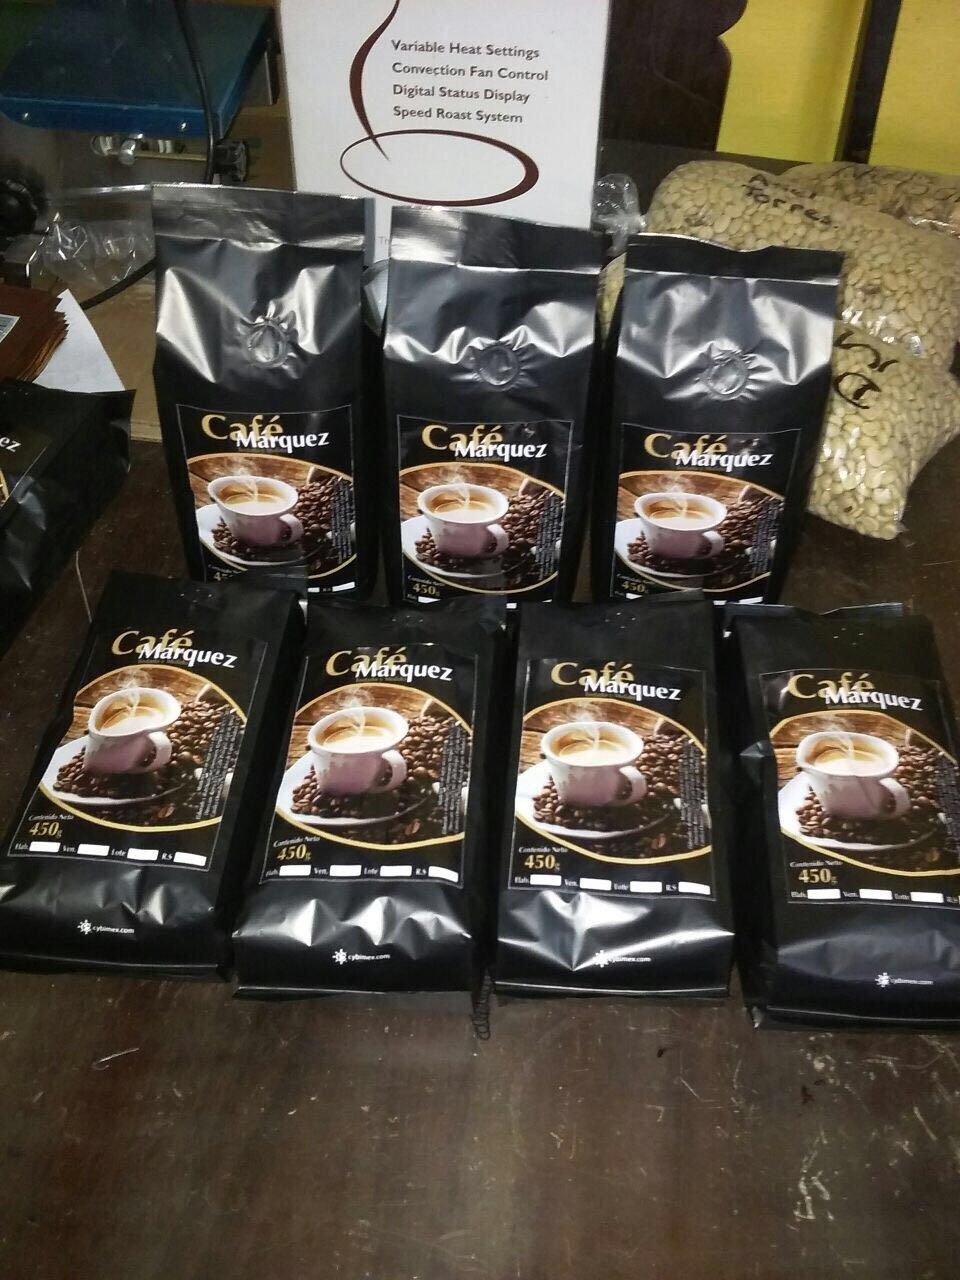 Coffee packs